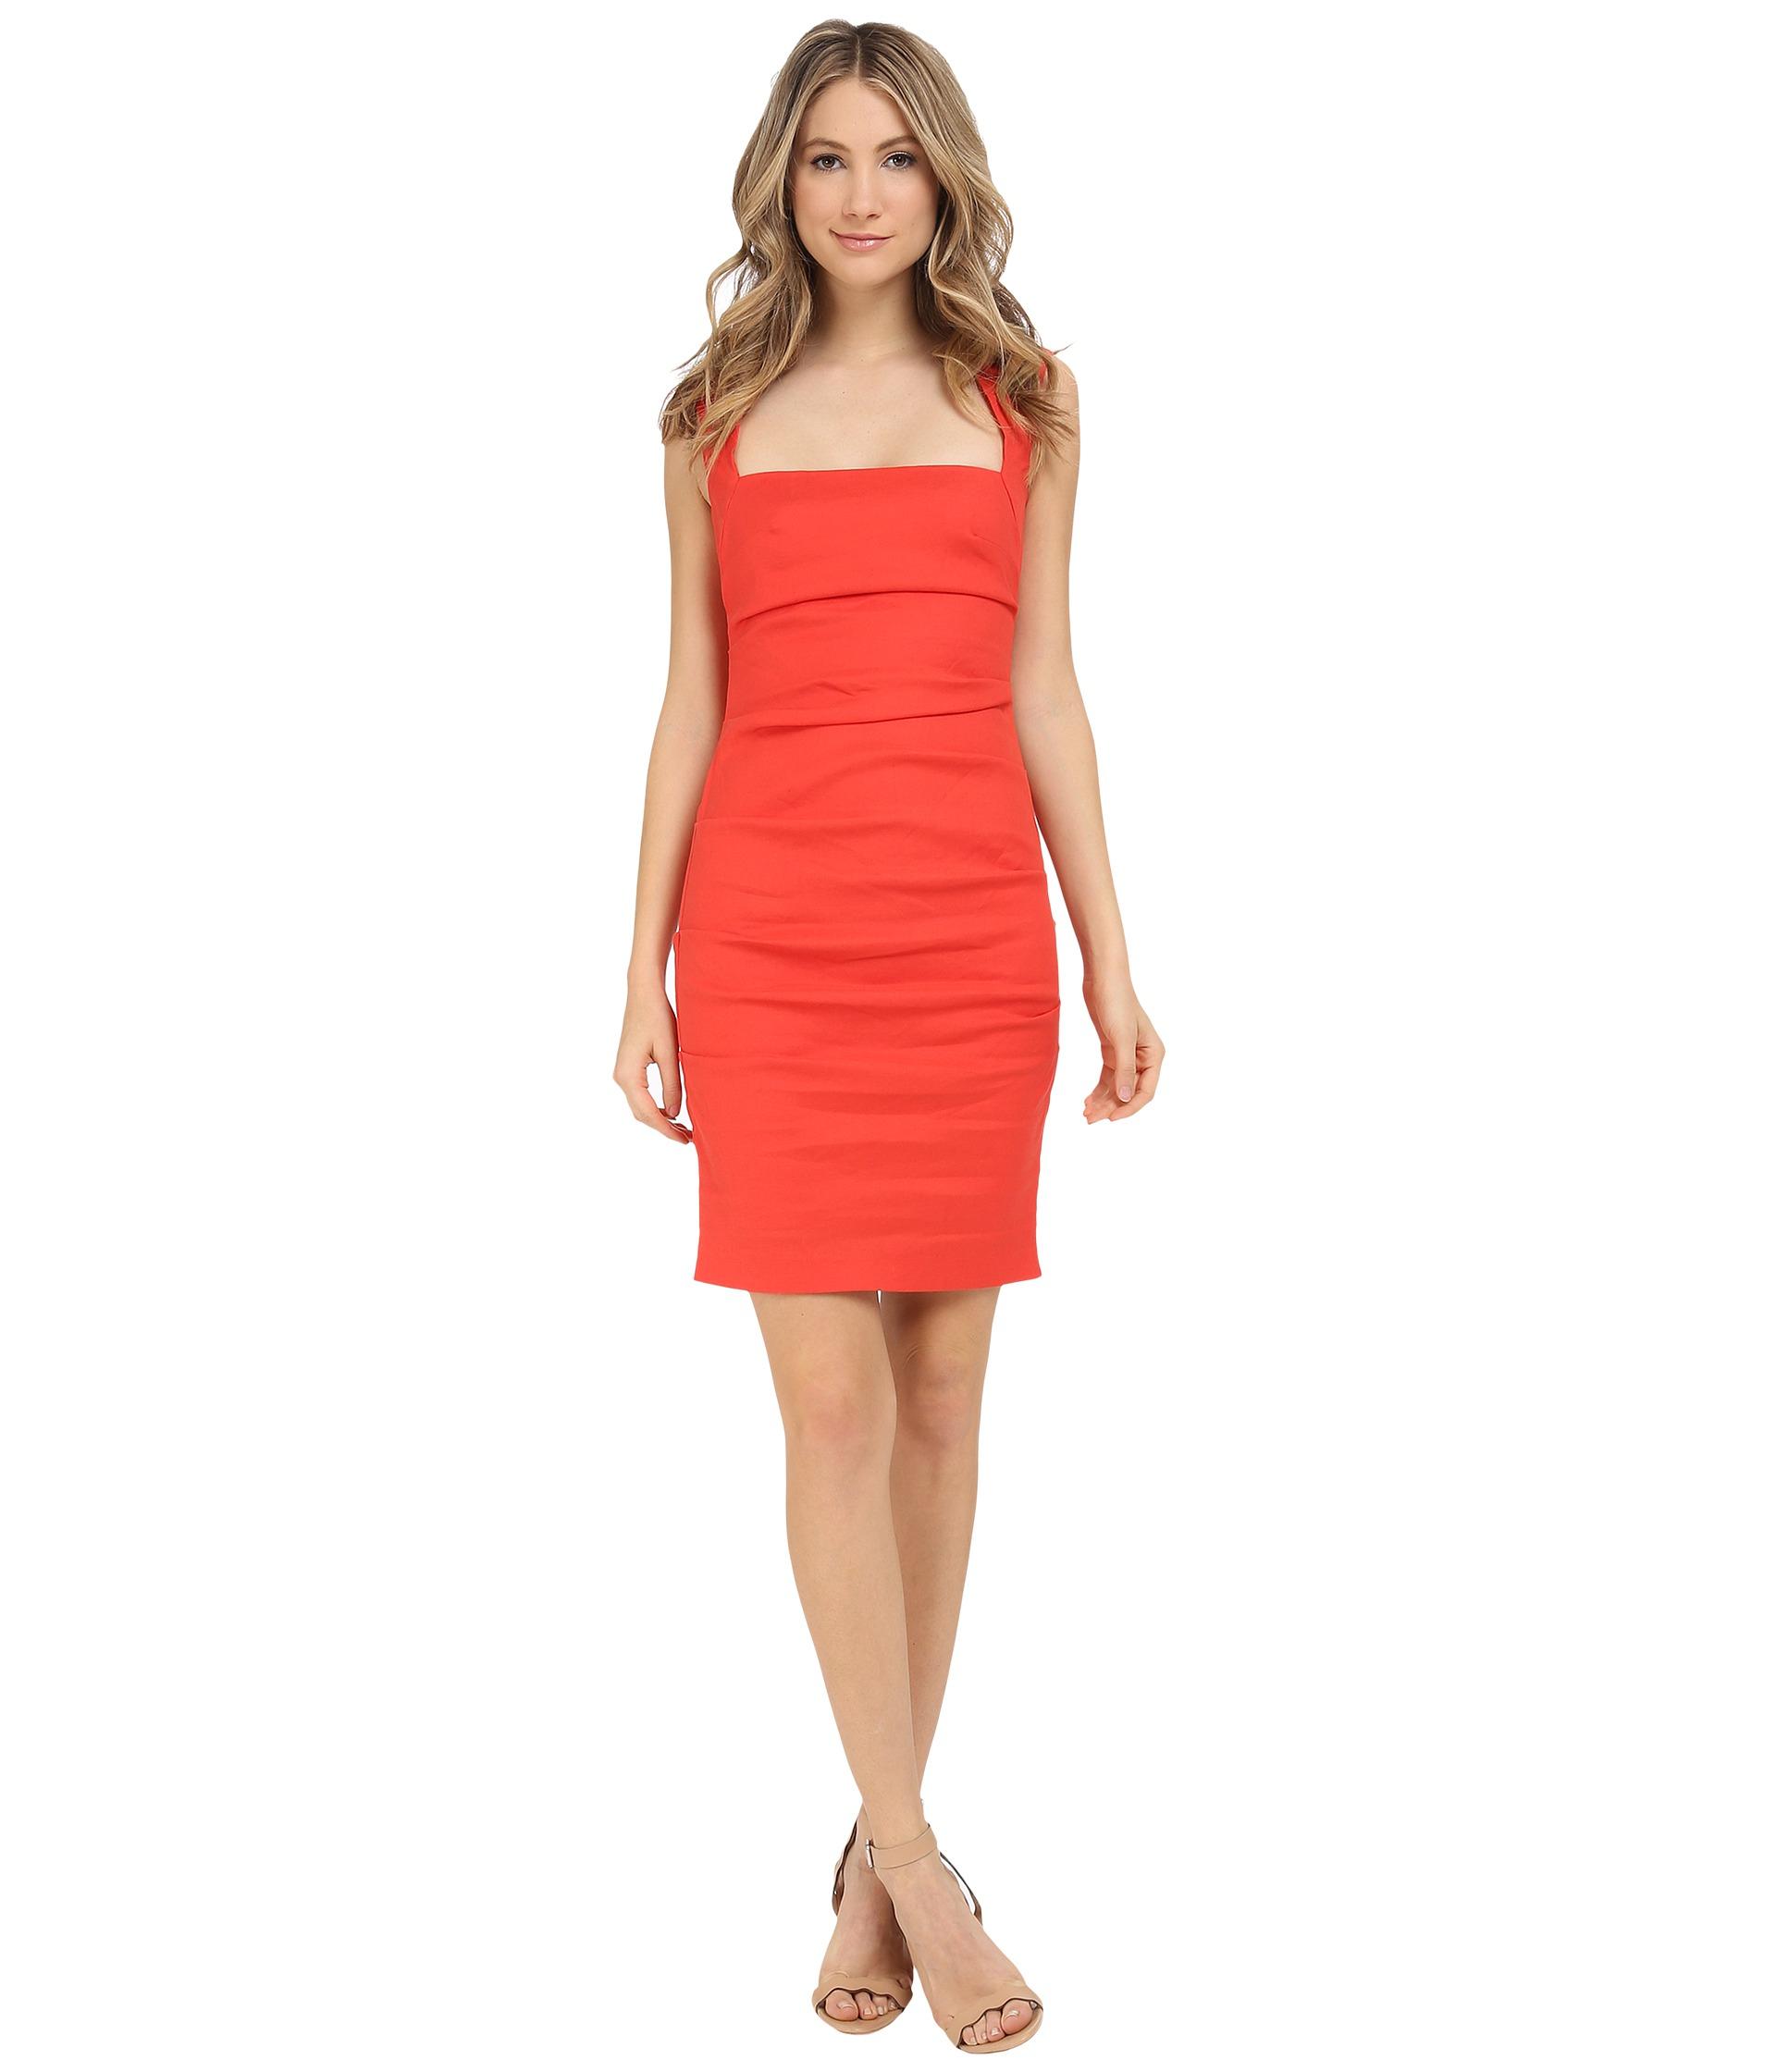 a426fcb14e5 Lyst - Nicole Miller Stretch Linen Cutout Back Dress in Black